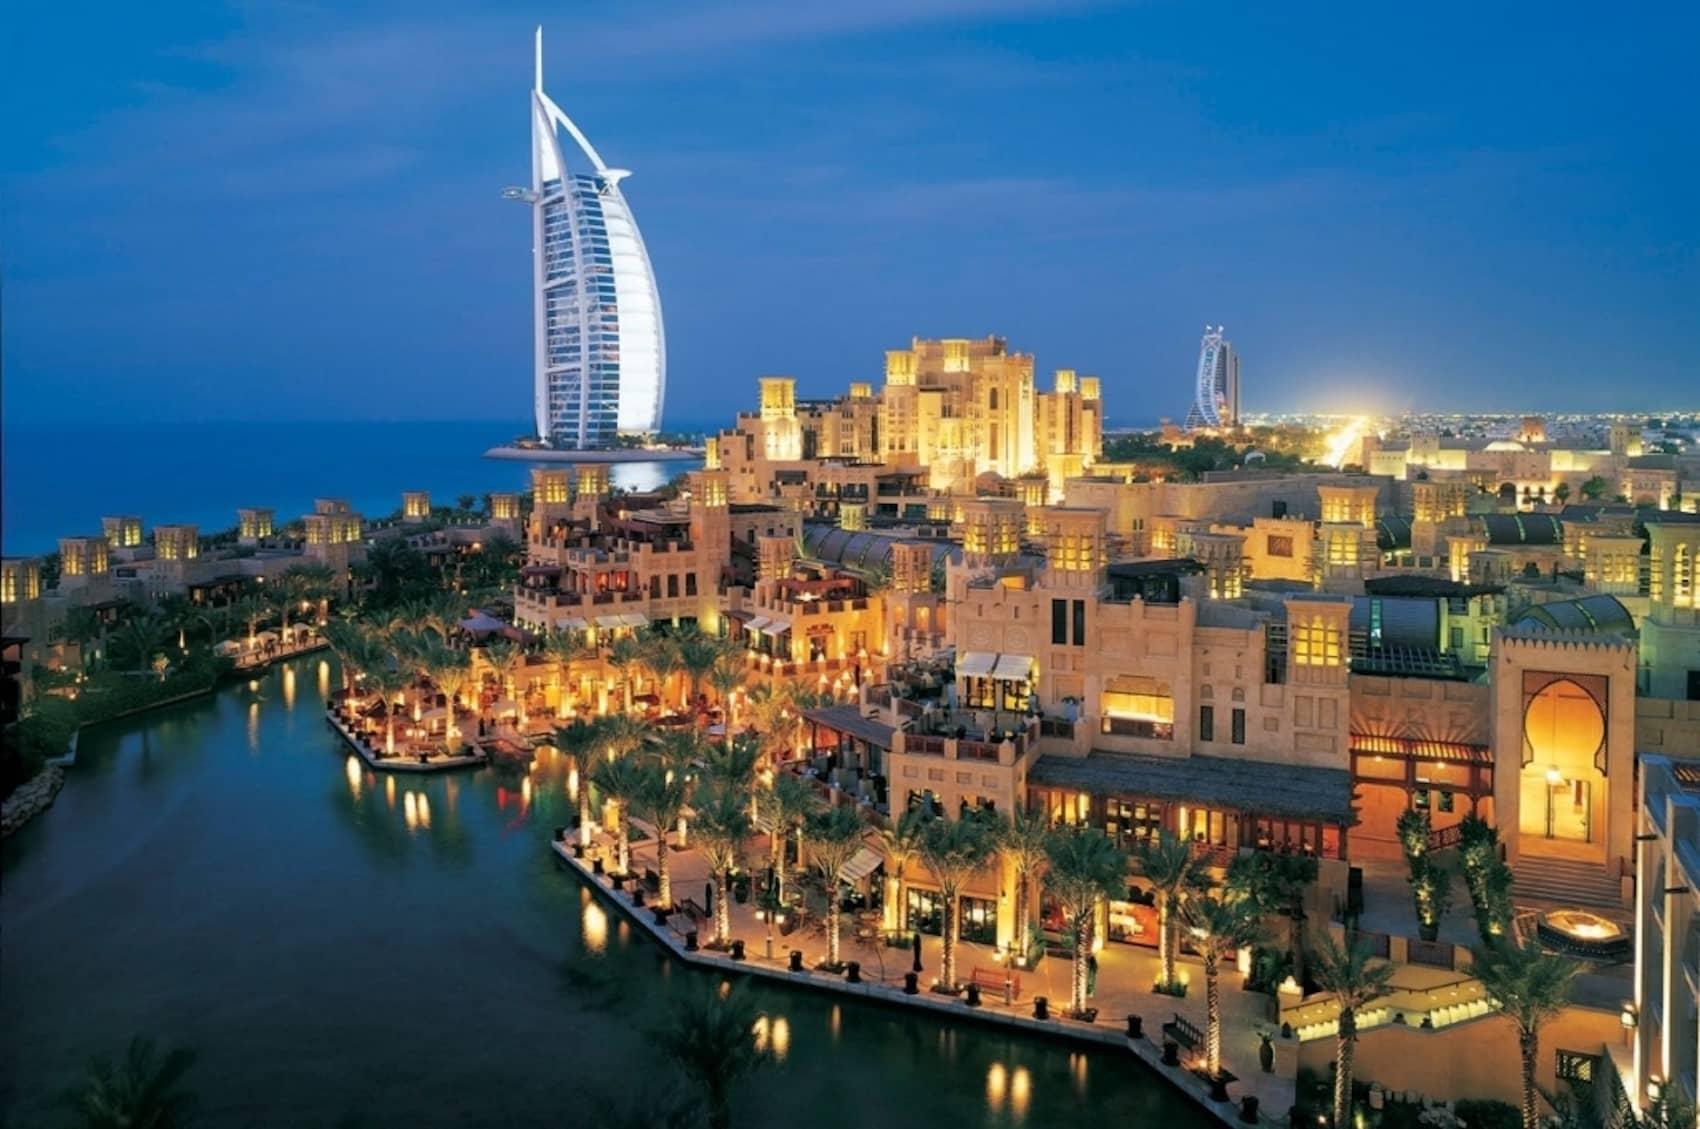 Madinat Jumeirah - Dubai - Viaggio di Nozze